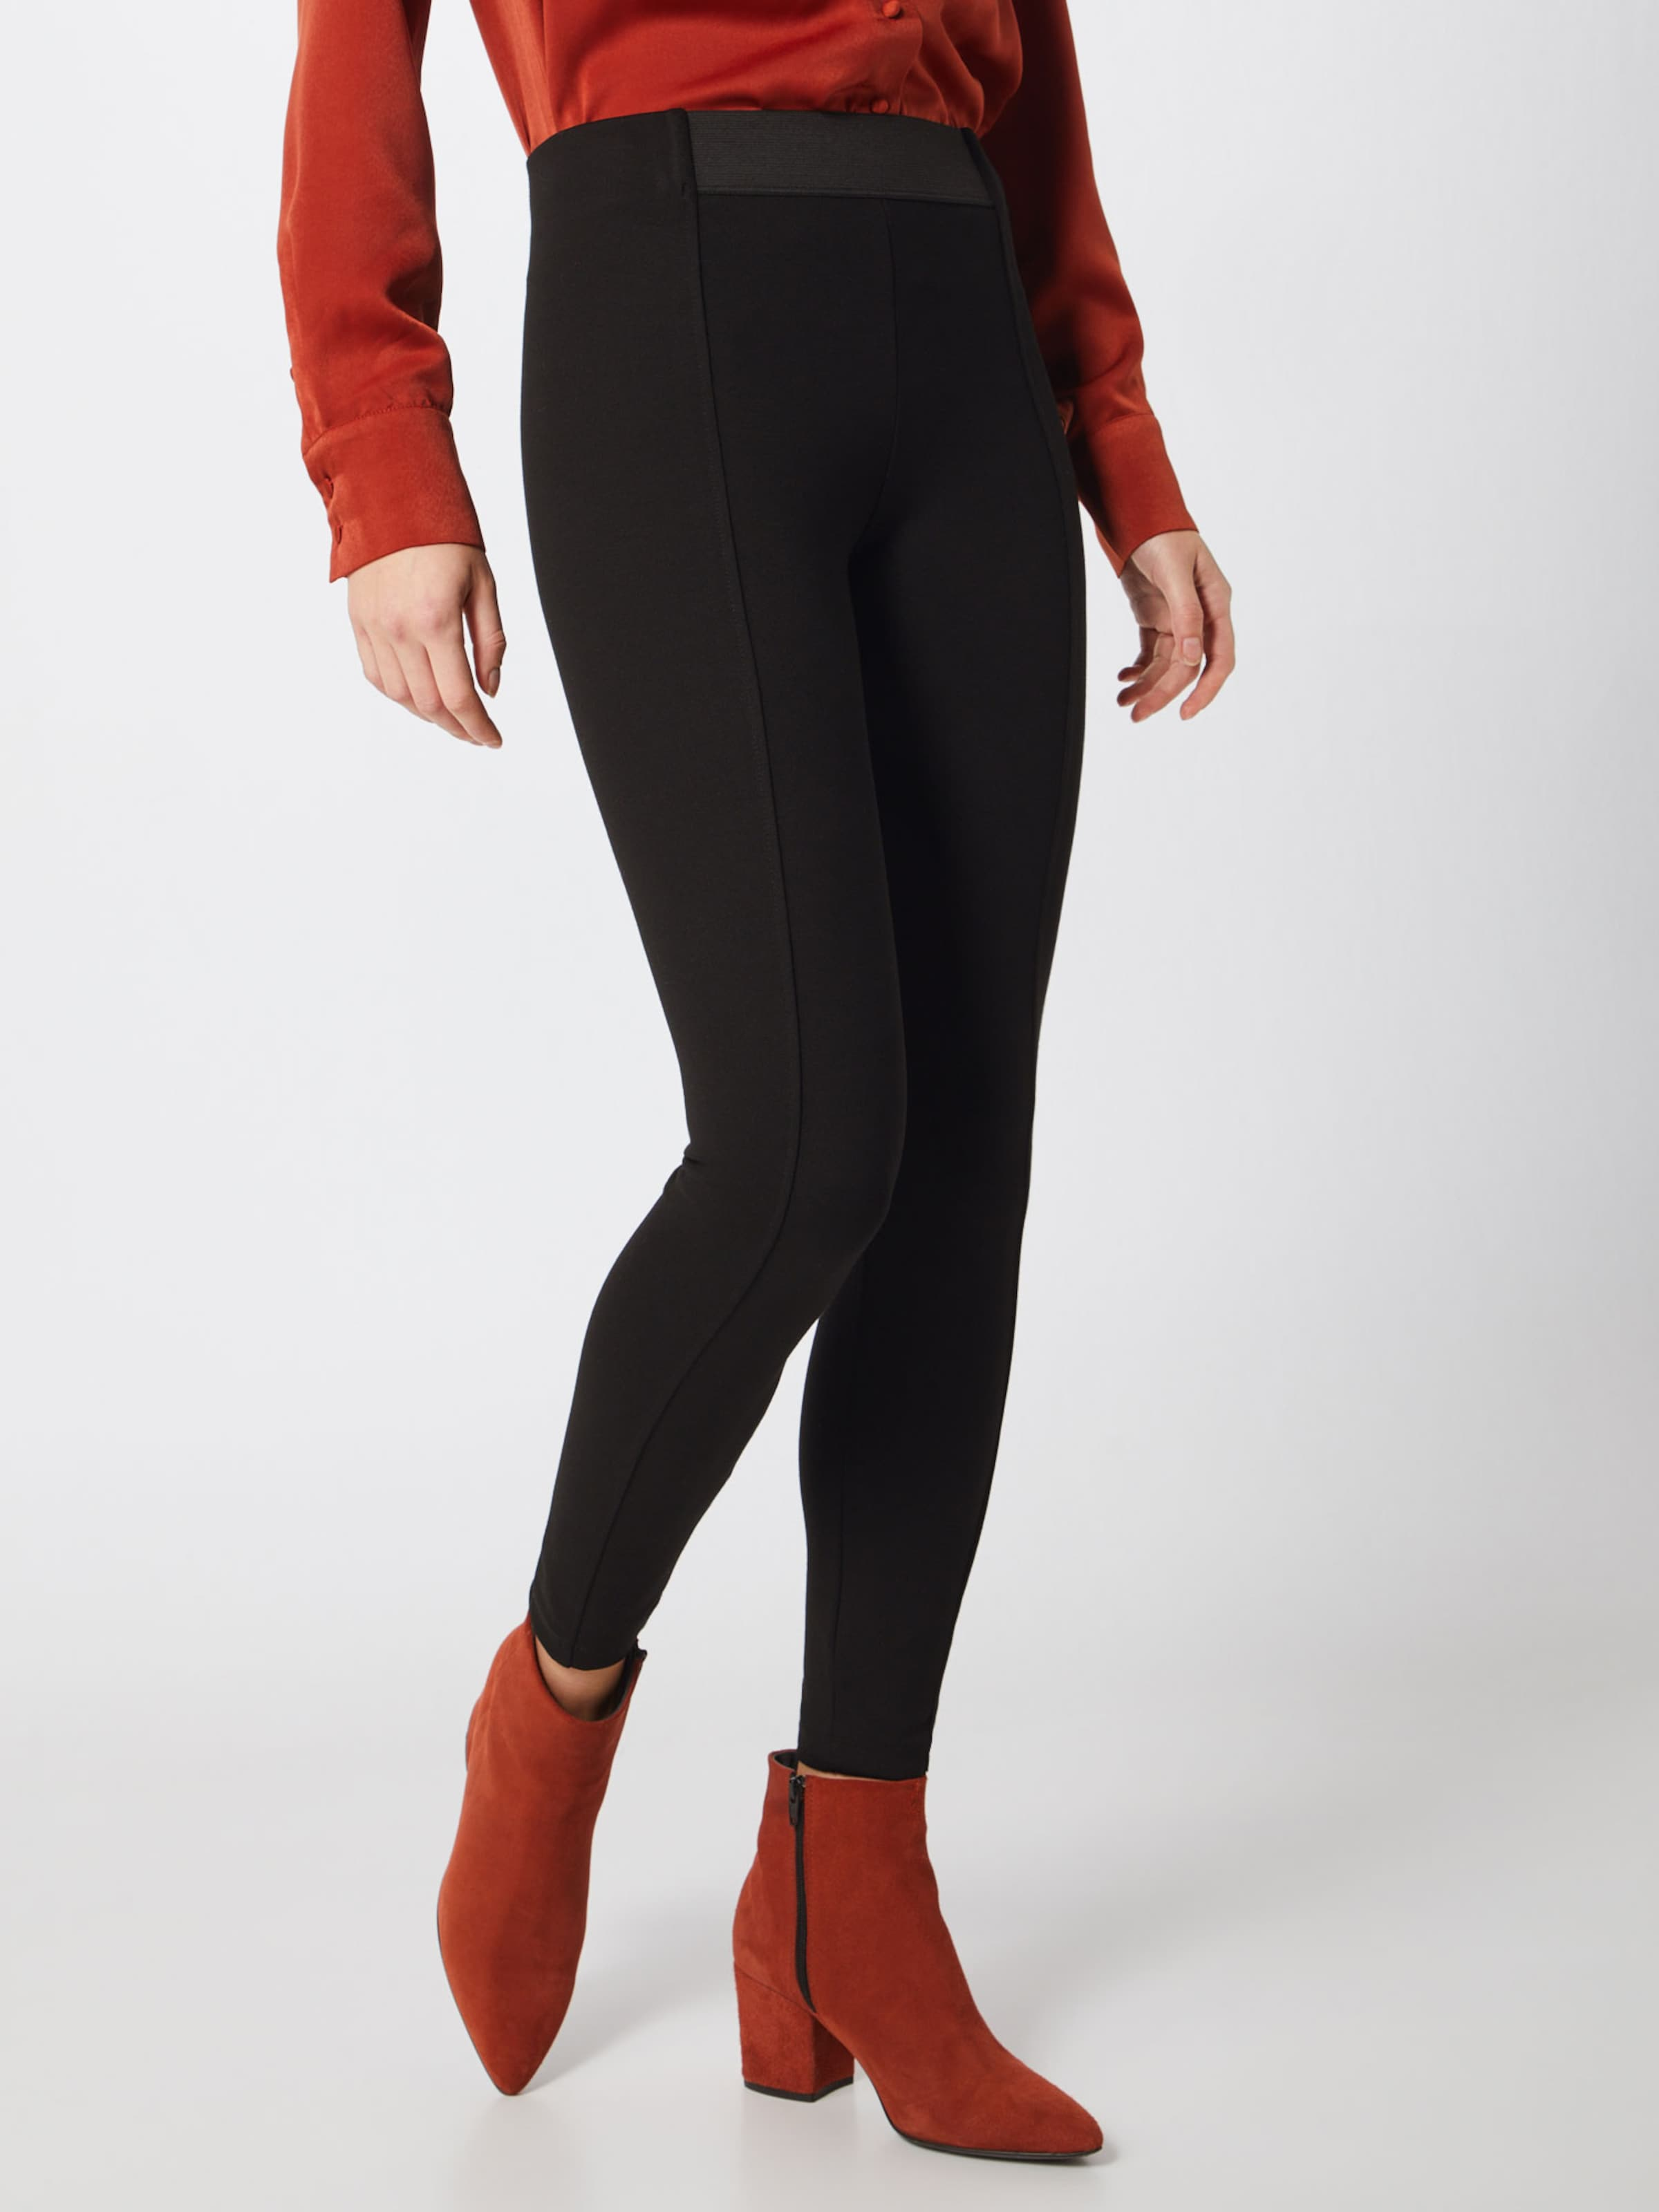 'eos Esprit Hose Knitted' Schwarz In Pants N8wOPXn0k